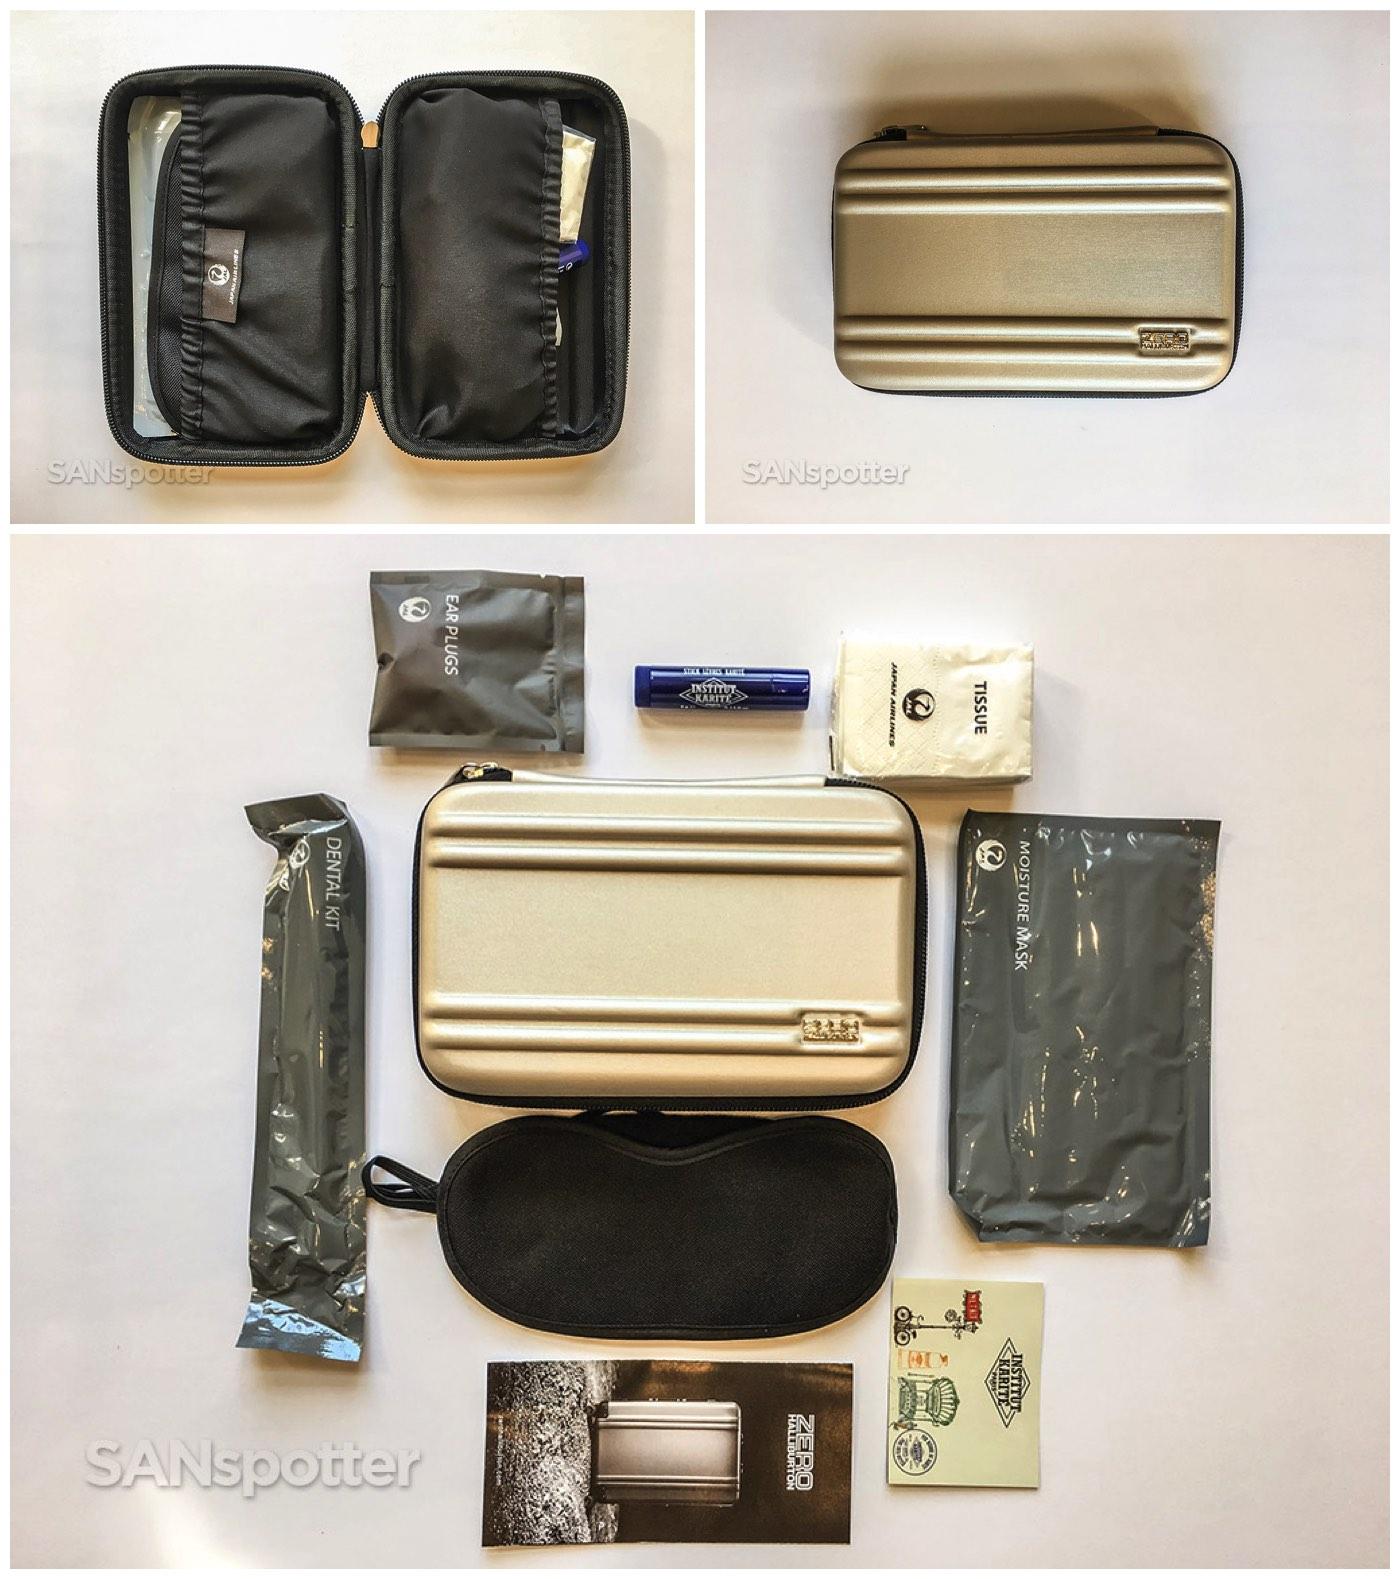 JAL business class amenity kit